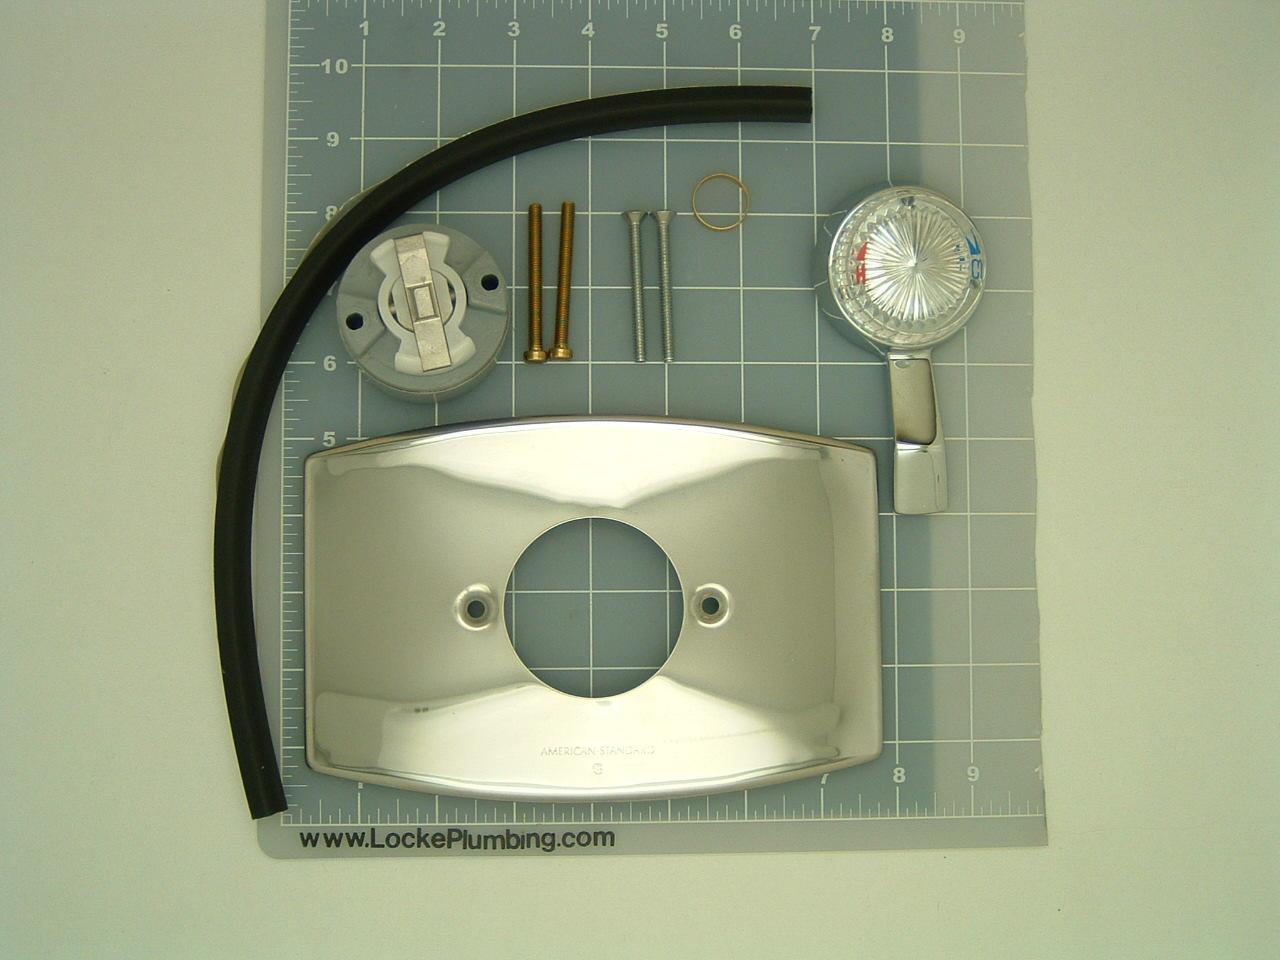 American Standard Aquarian 8 Gallon Tub and Shower Kit - Locke Plumbing